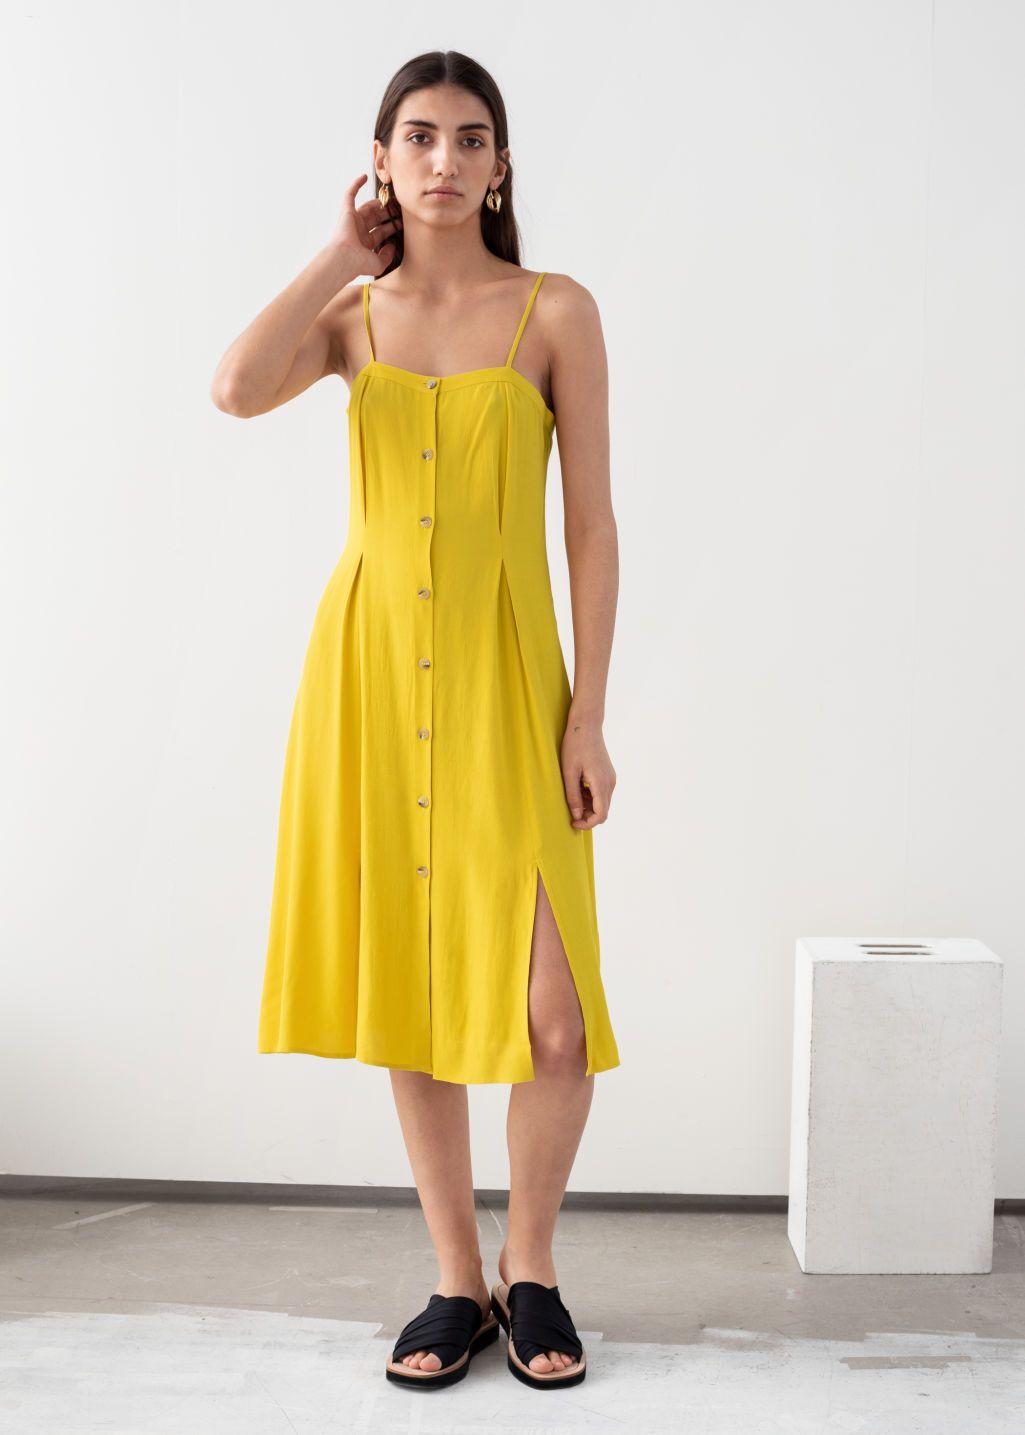 Square Neck Button Up Midi Dress Midi Dress Dresses Fashion Clothes Women [ 1435 x 1025 Pixel ]